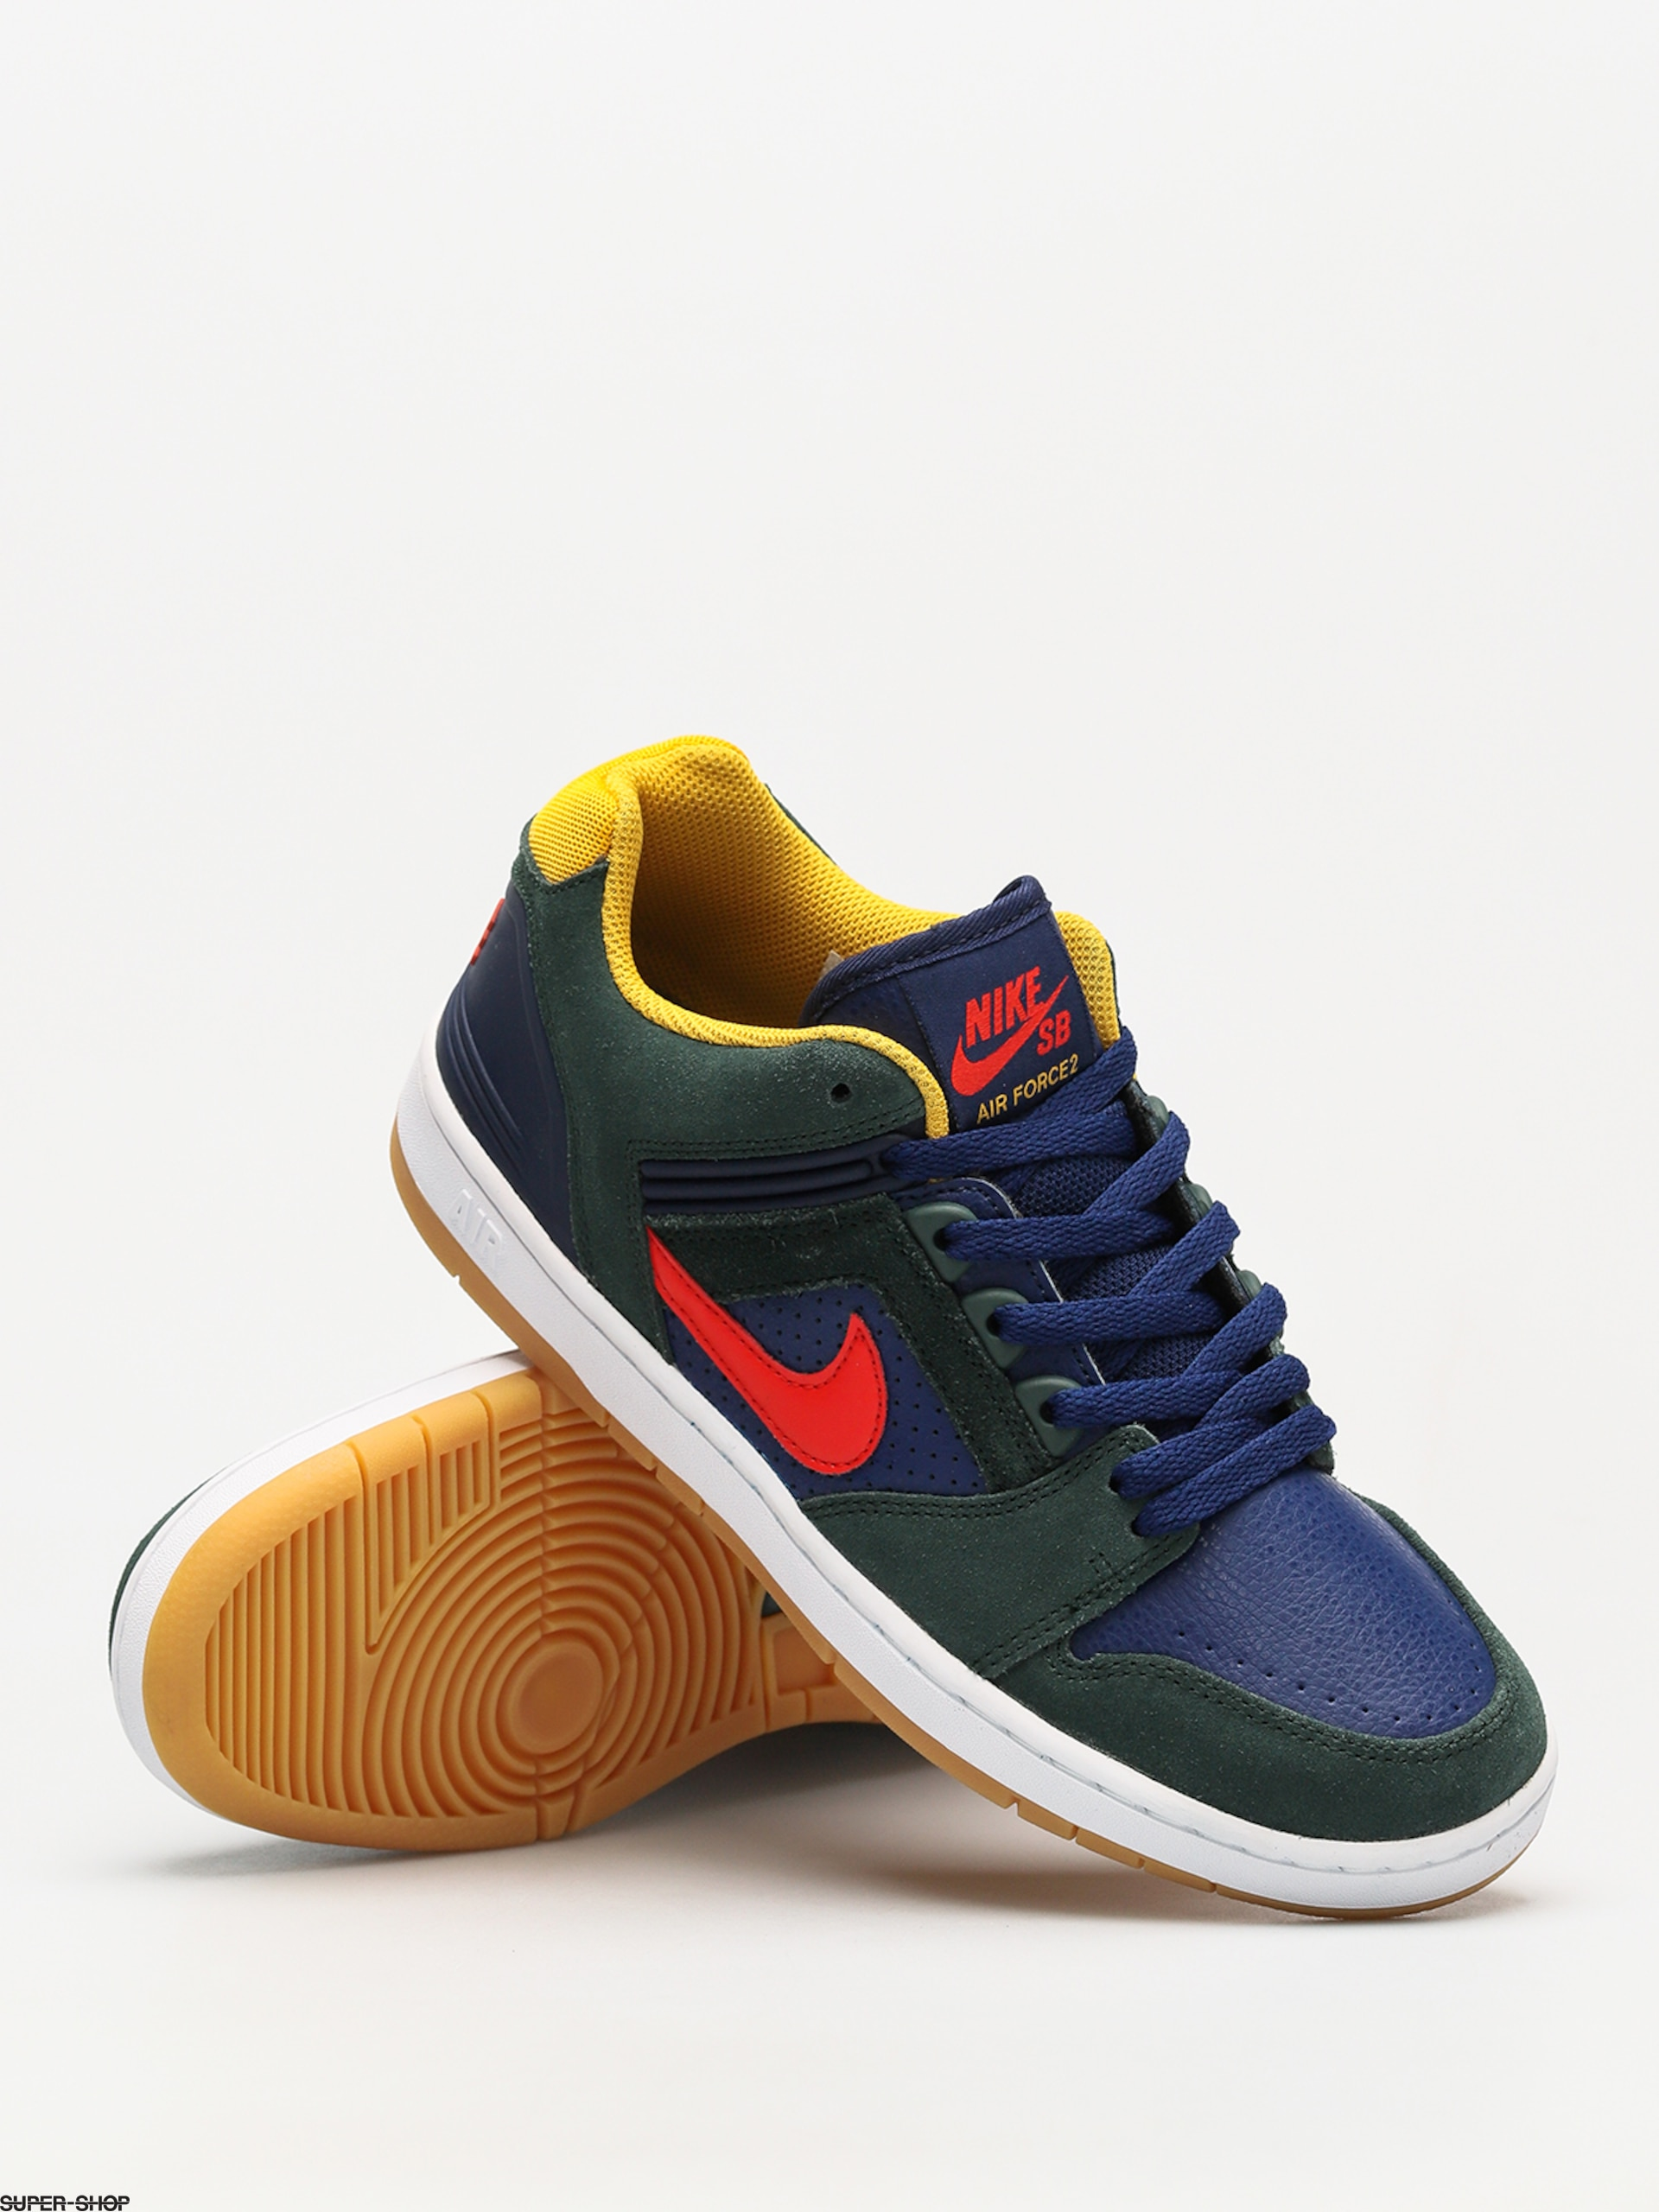 5b8ed39ea9fe Nike SB Shoes Sb Air Force II Low (midnight green habanero red blue void)